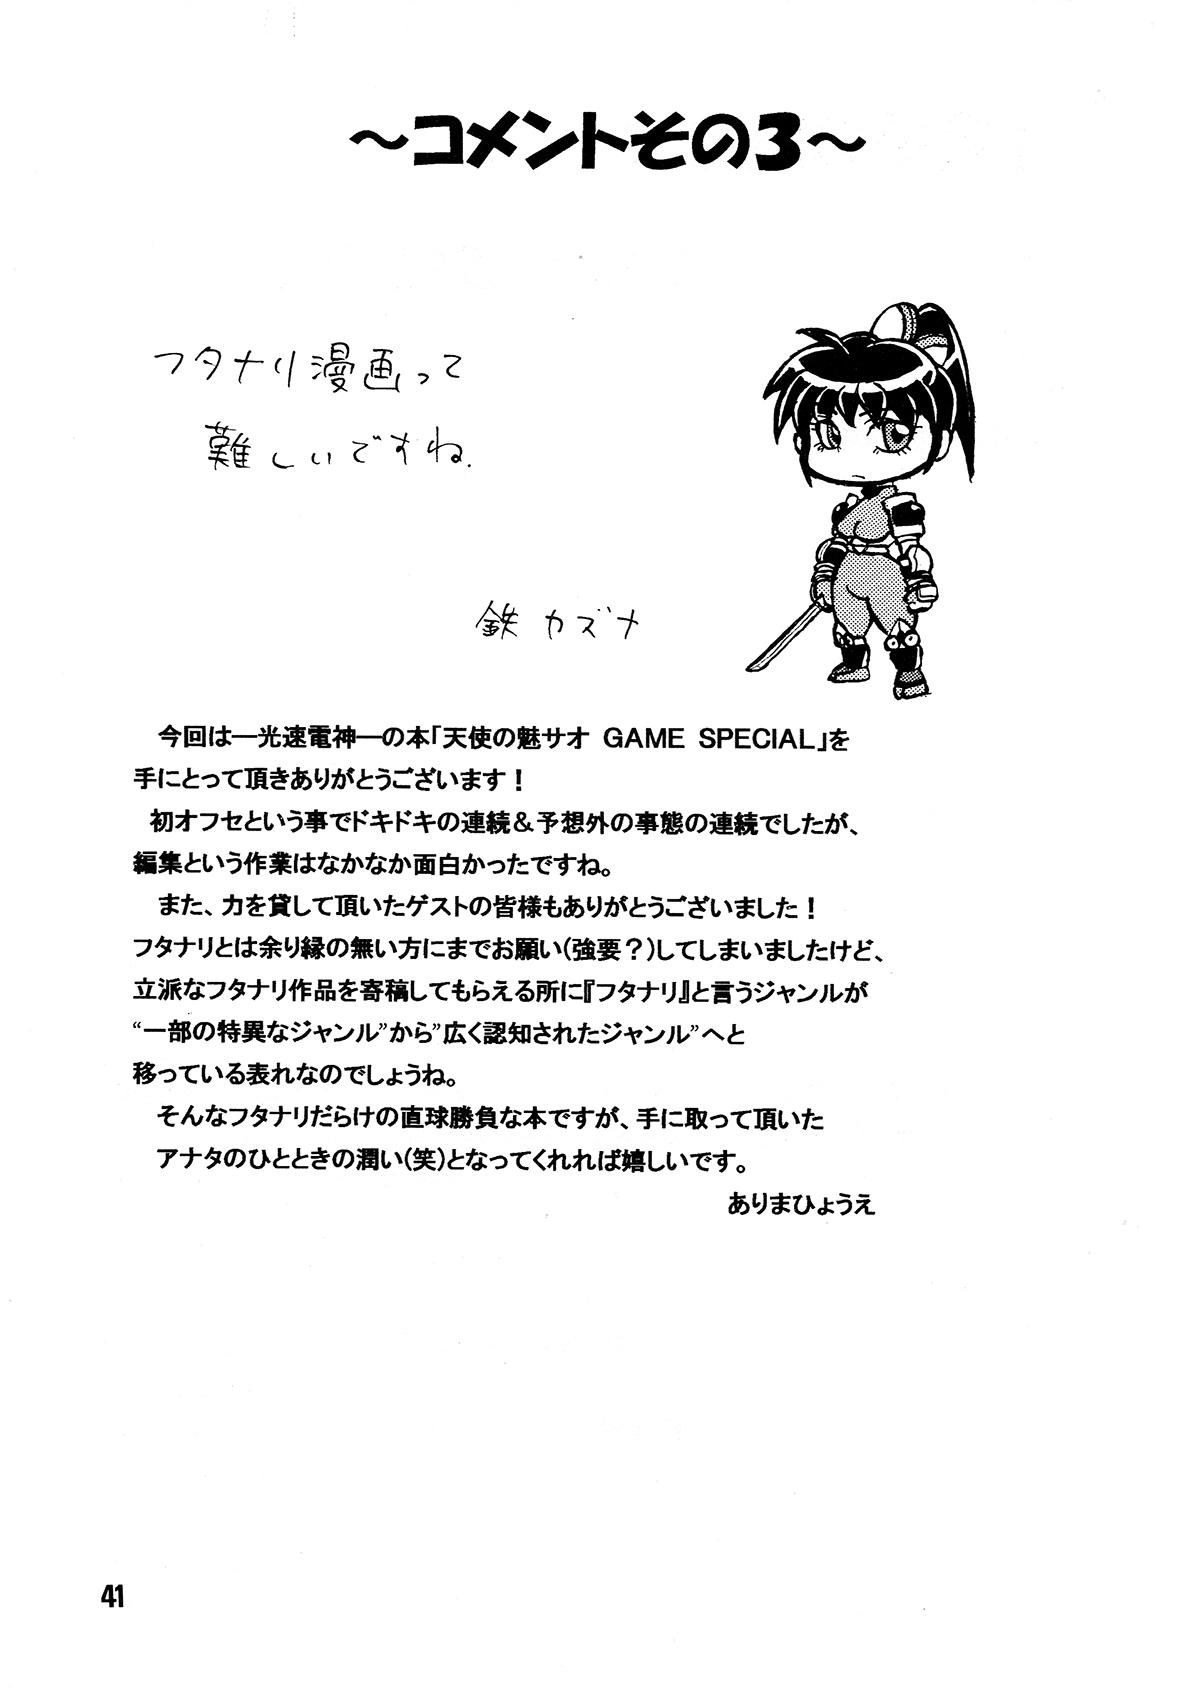 Tenshi no Misao Game Special 40